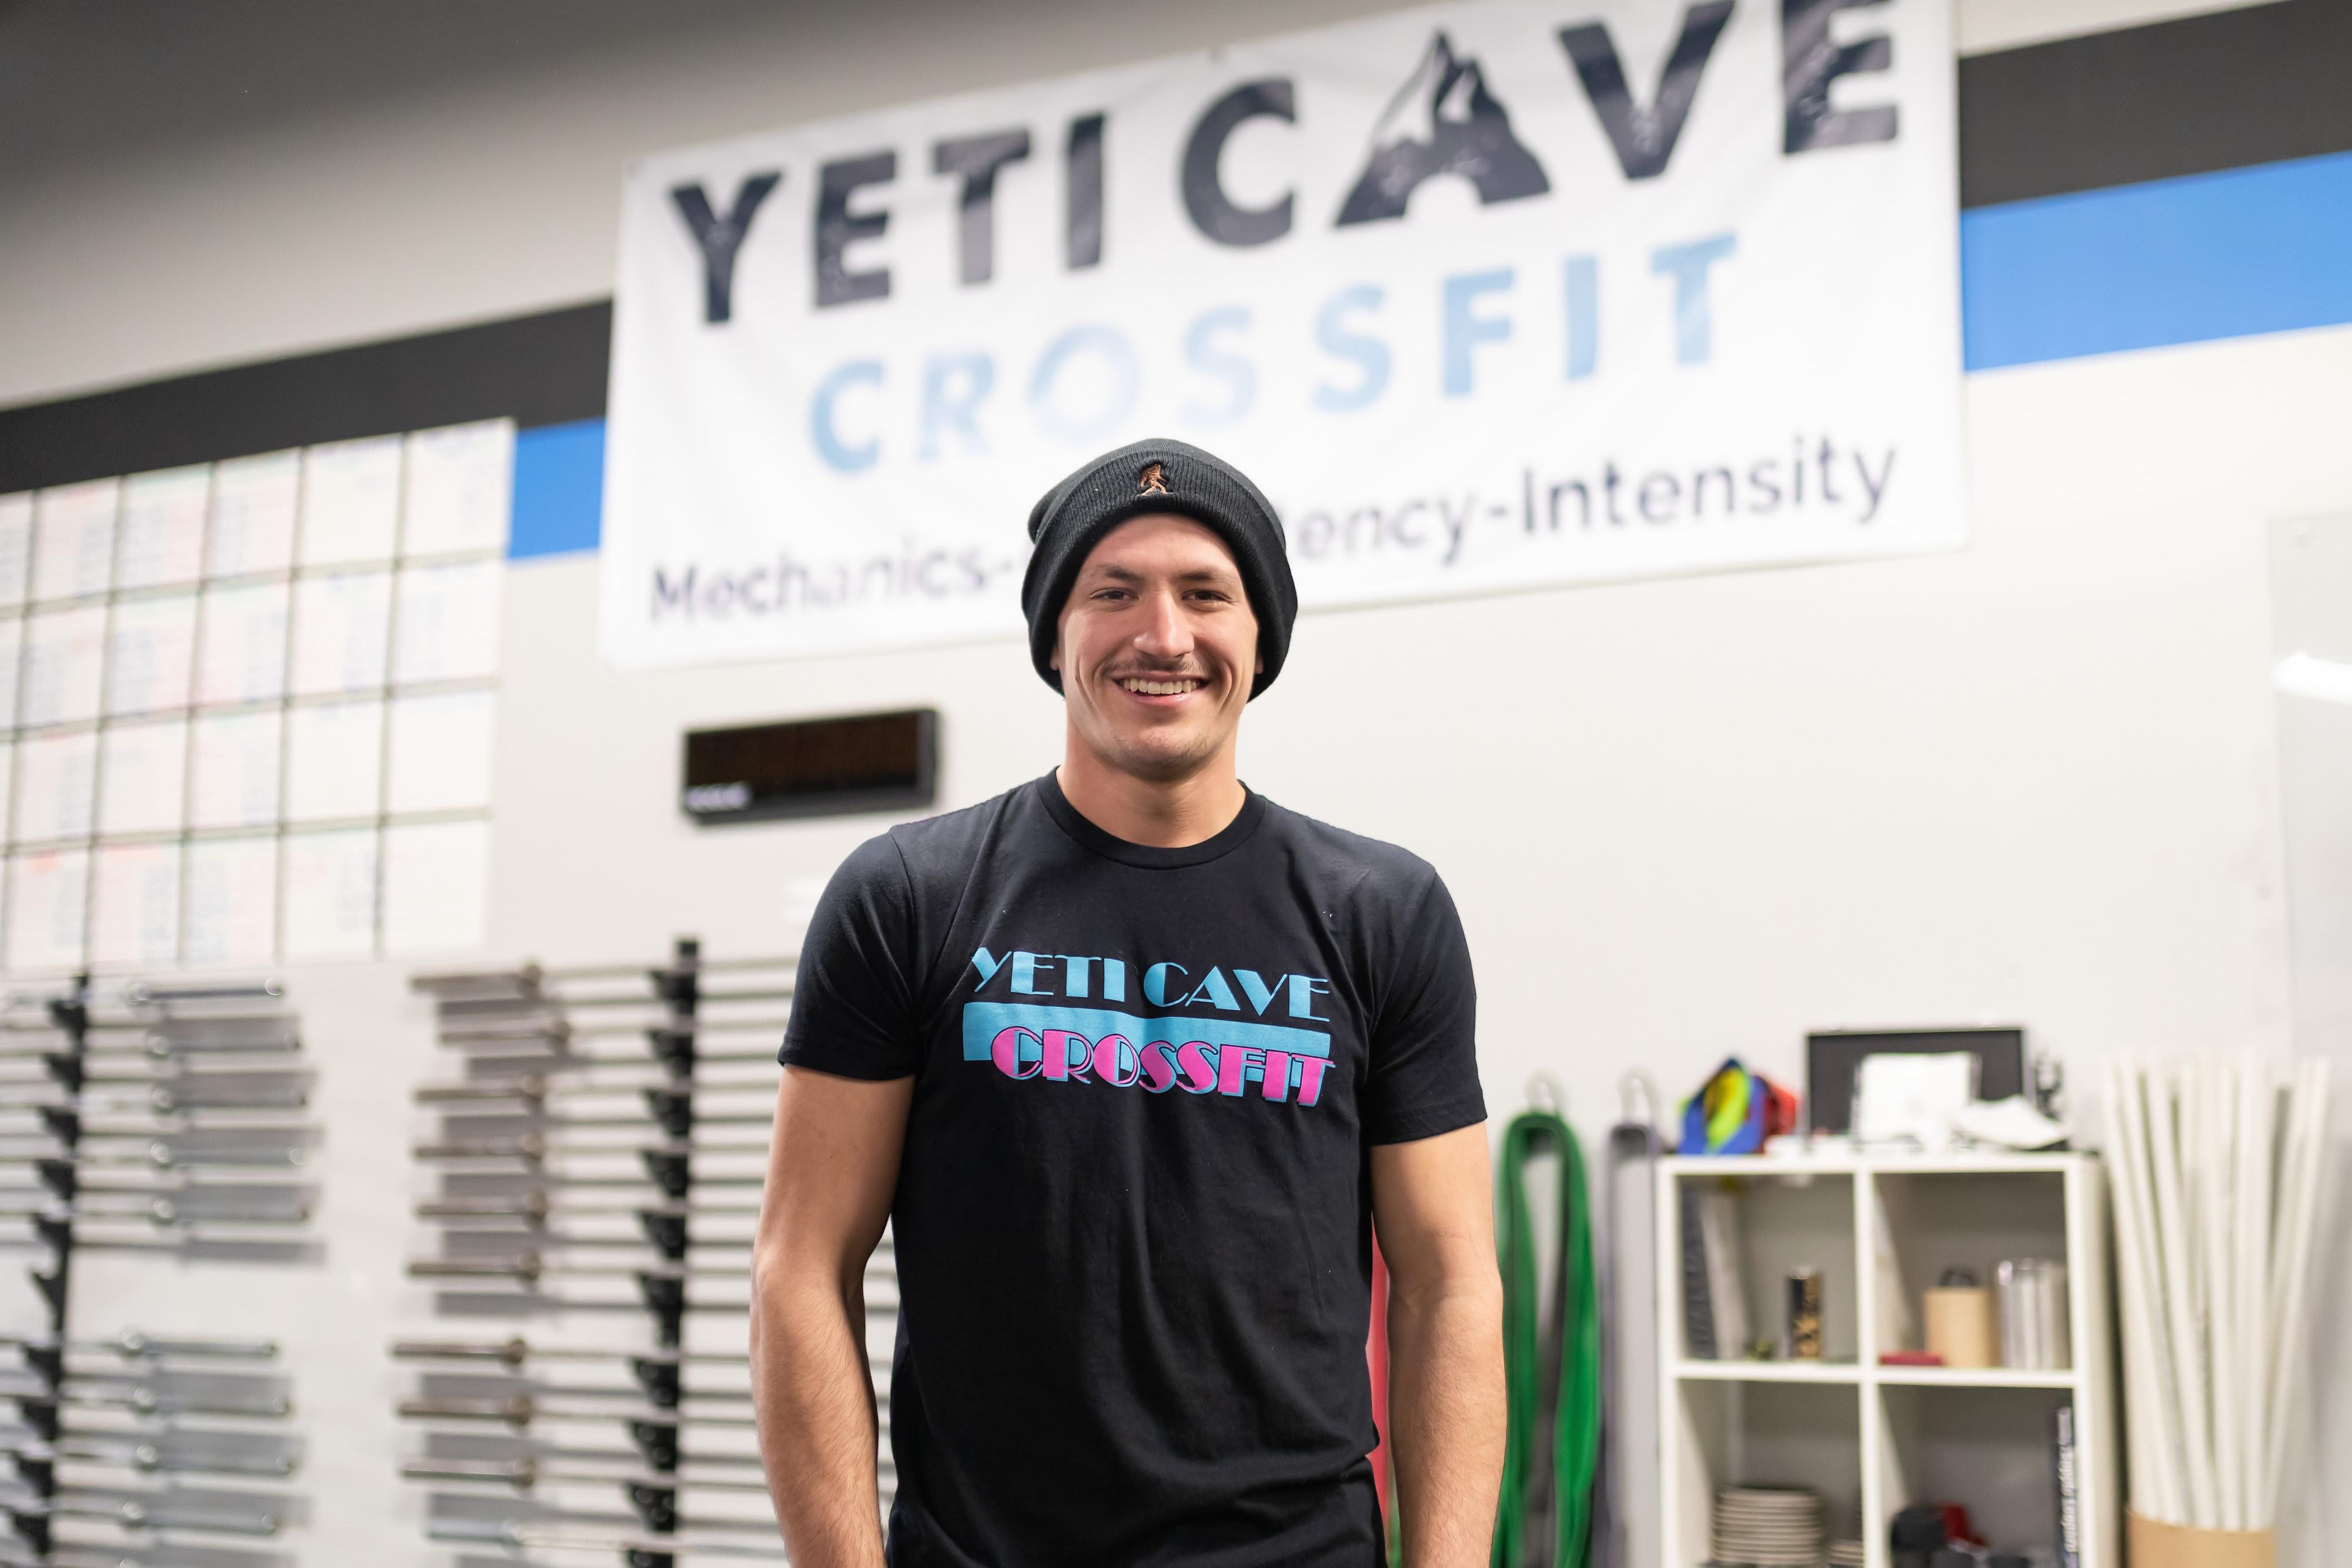 Jarrod Seitz in Fort Collins - Yeti Cave CrossFit